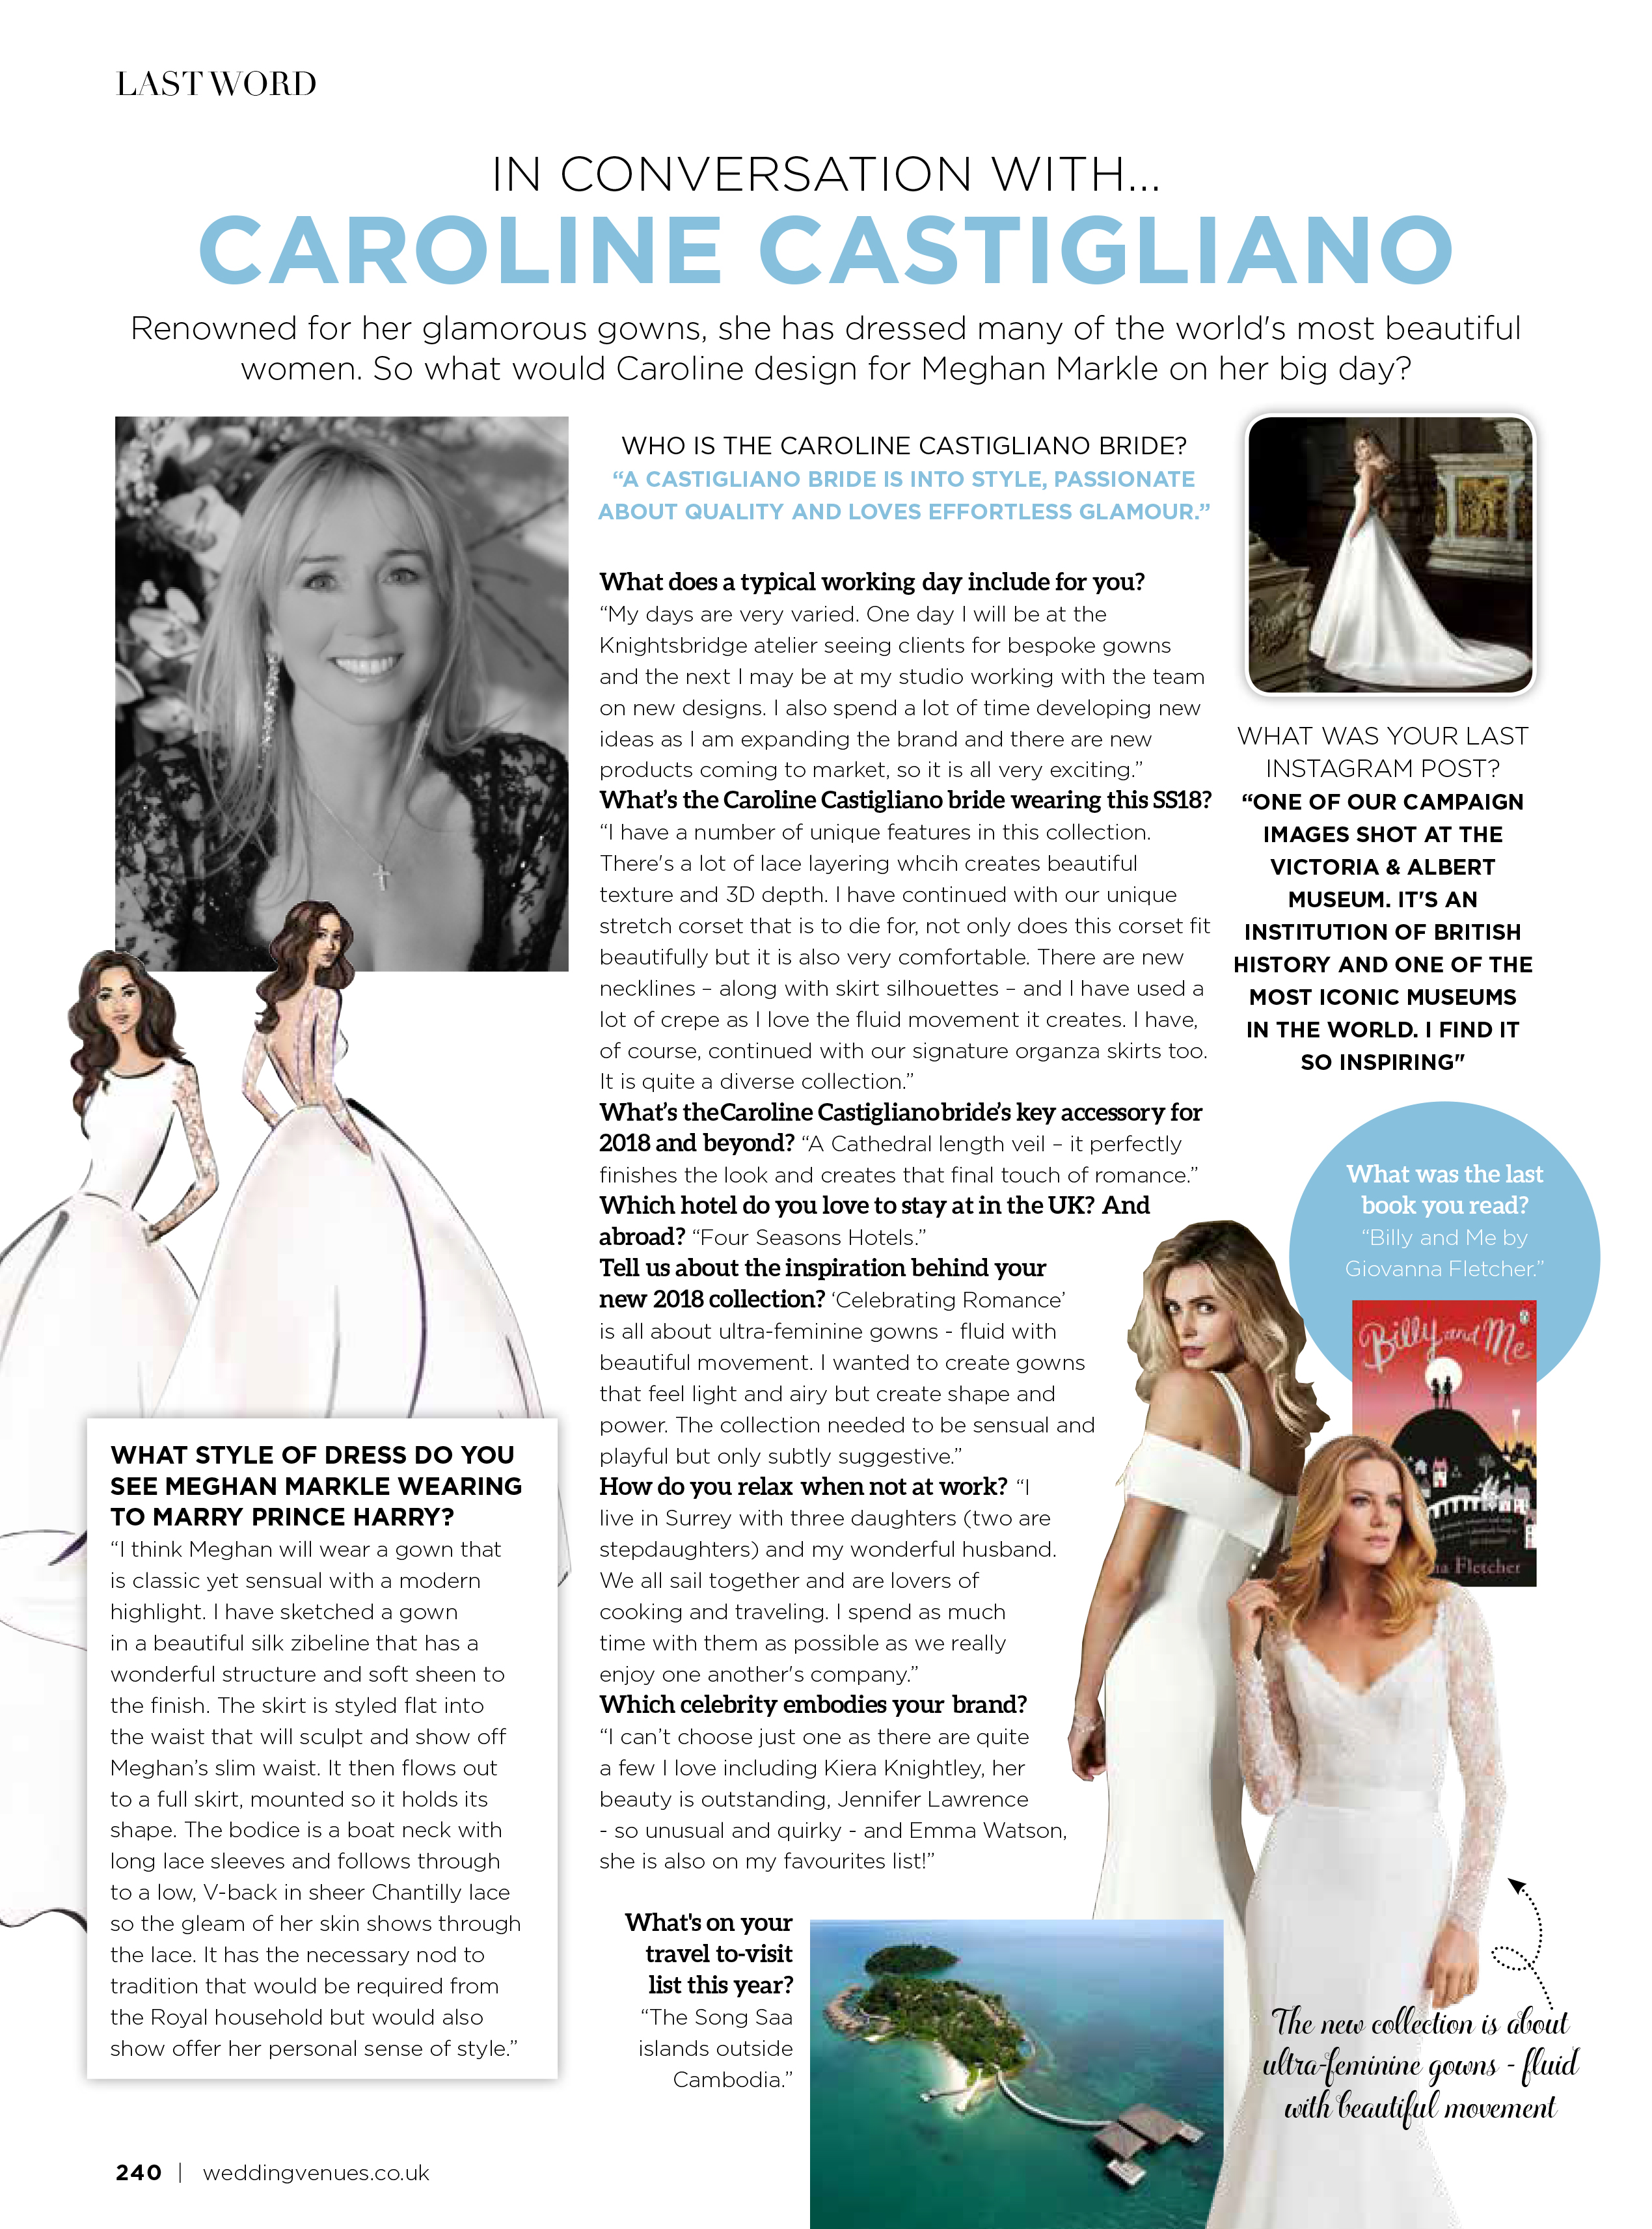 wedding dress designer Caroline Castigliano